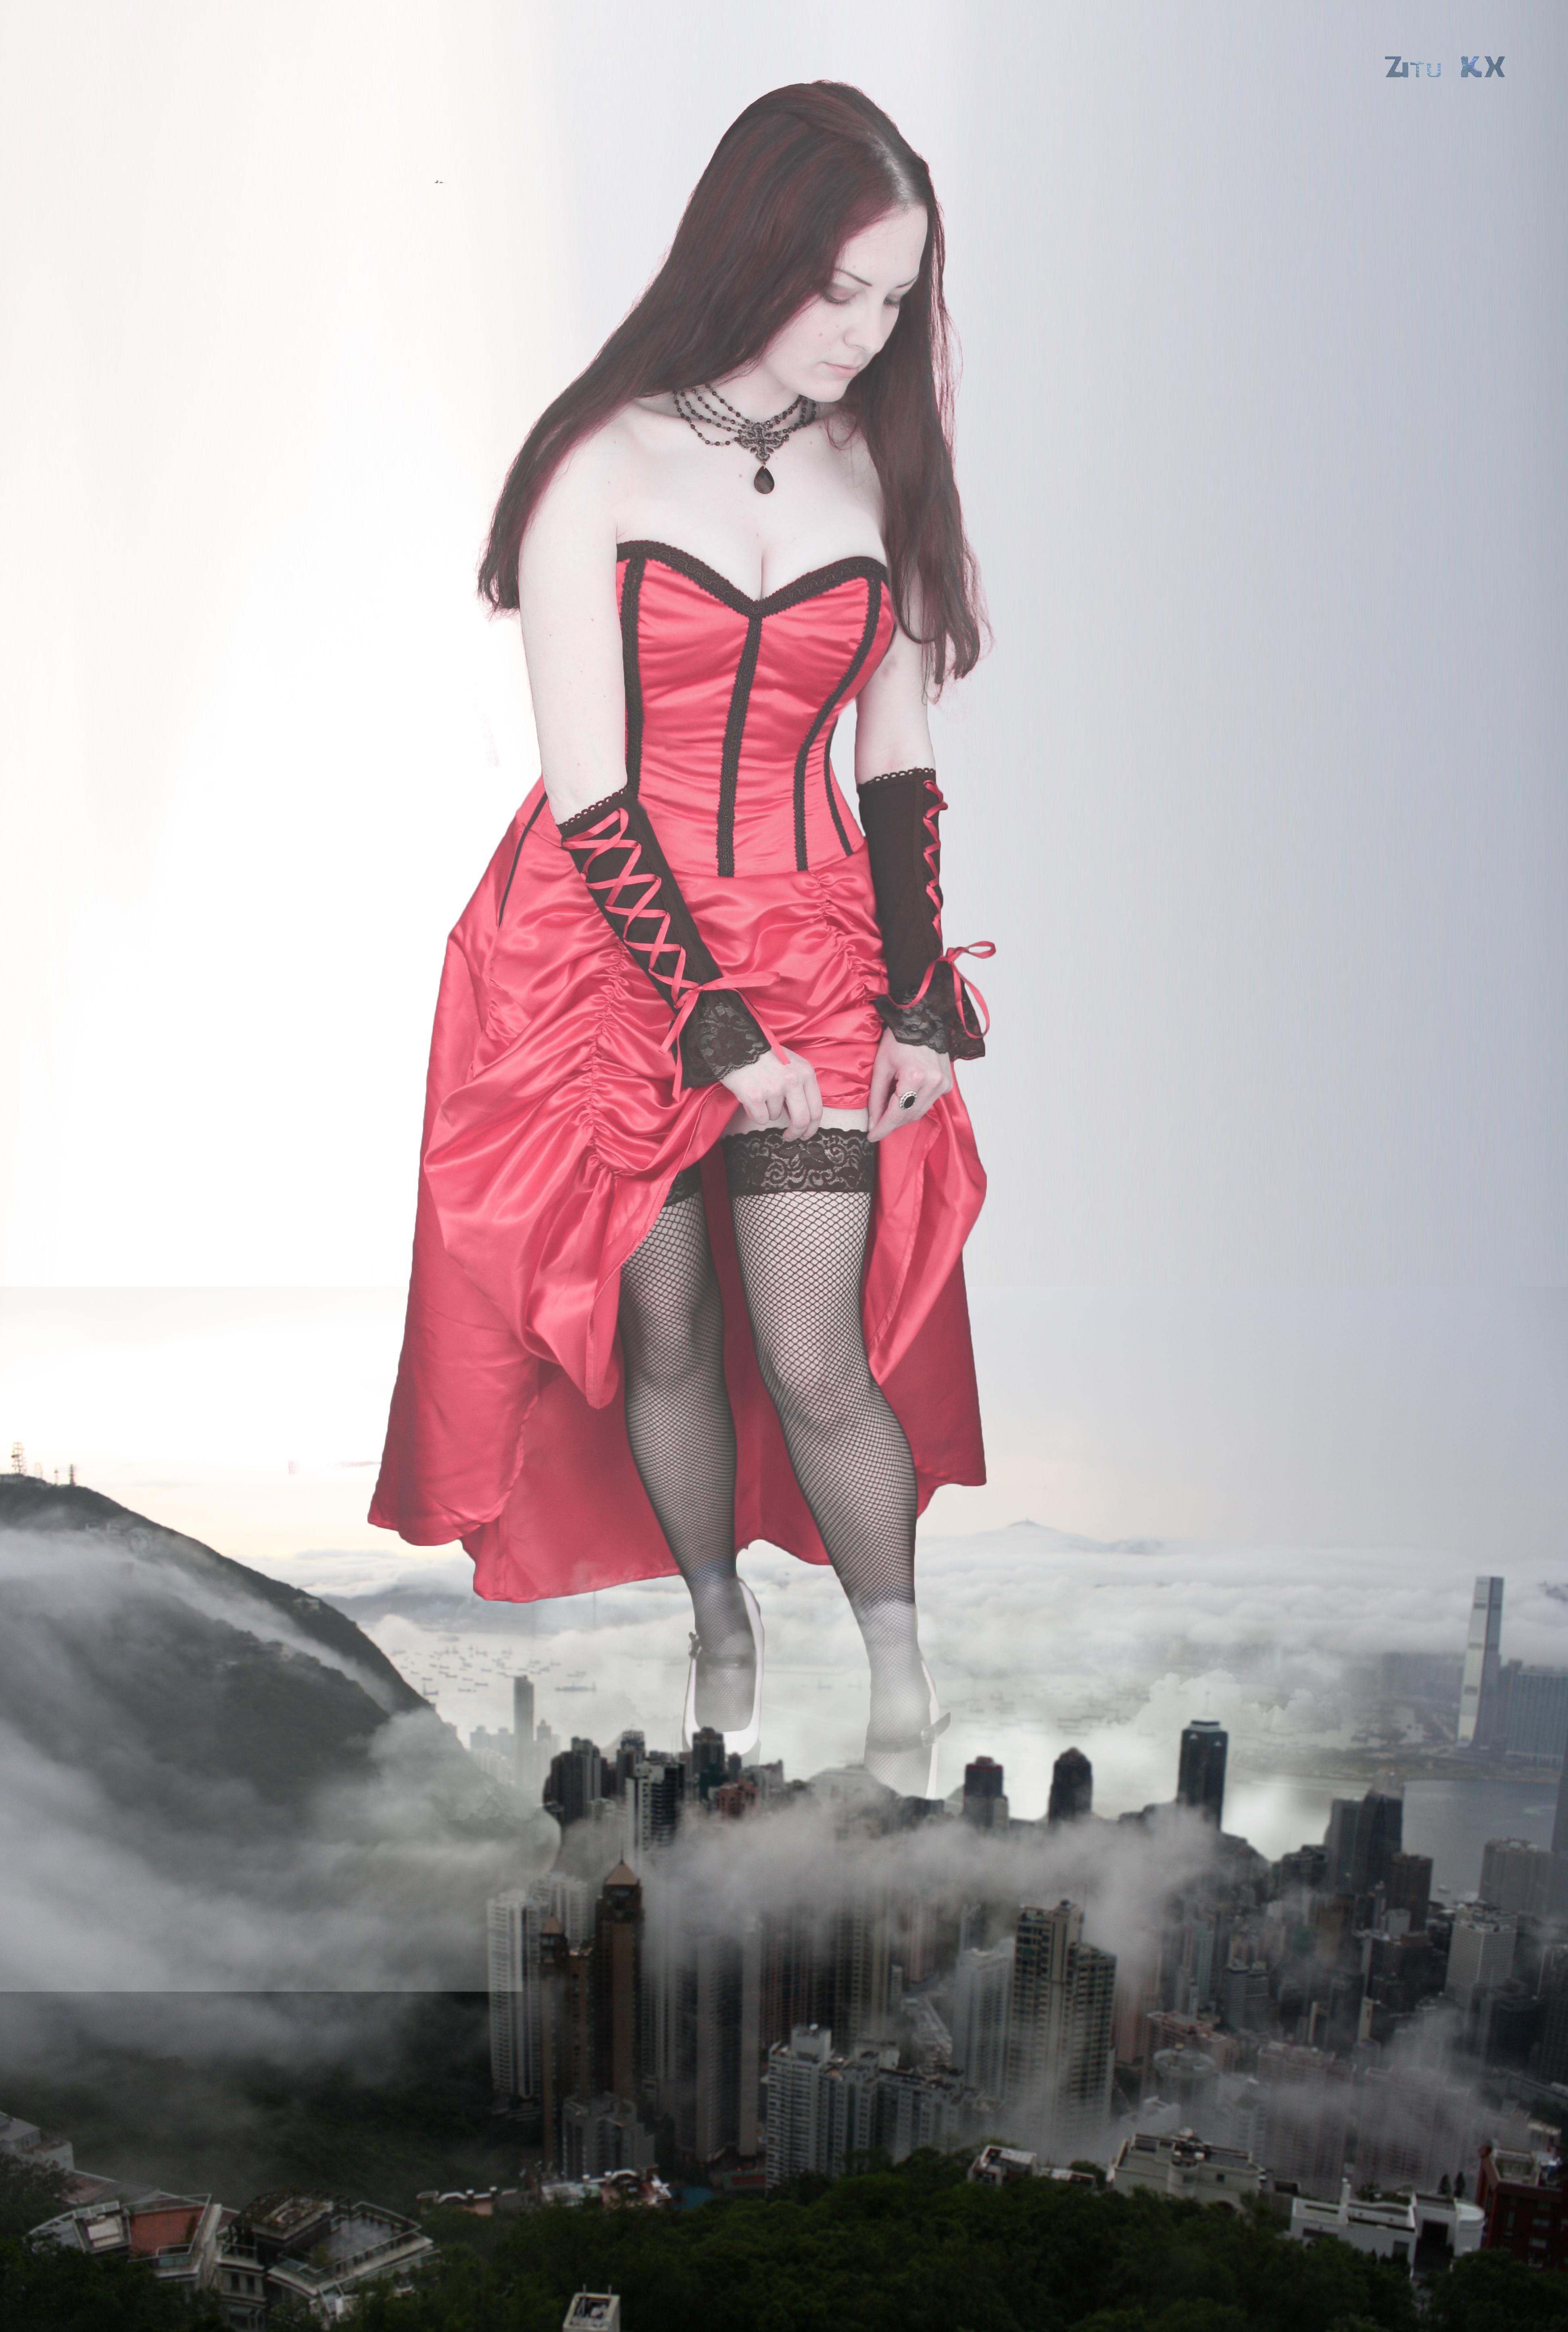 Goddess in the mist by ZituKX